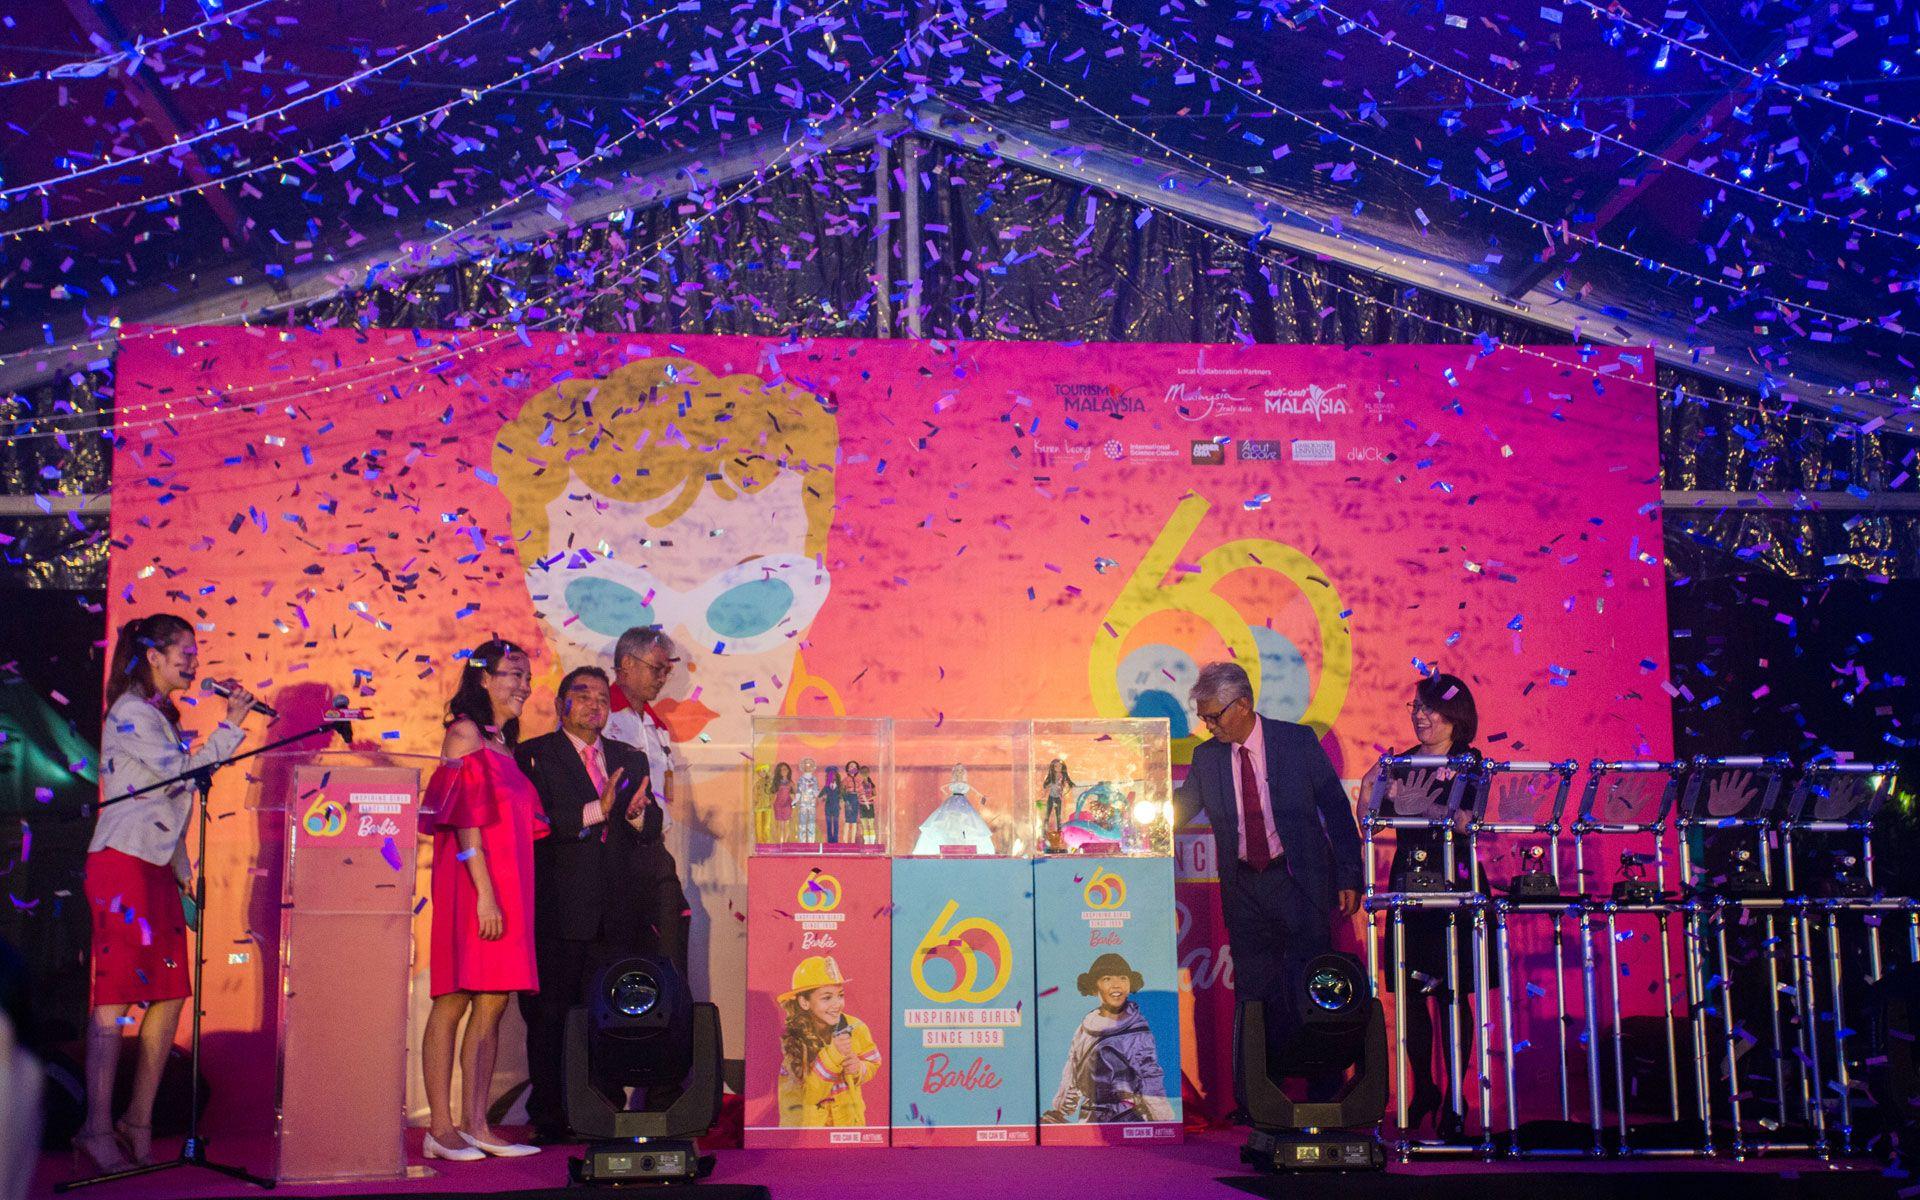 Choo Mei Sze, Christine Chan, Dato' Dr Ammar Abd Ghapar, Datuk Rozlan Mohamed, Zulkifly Md Said and Michelle Wan